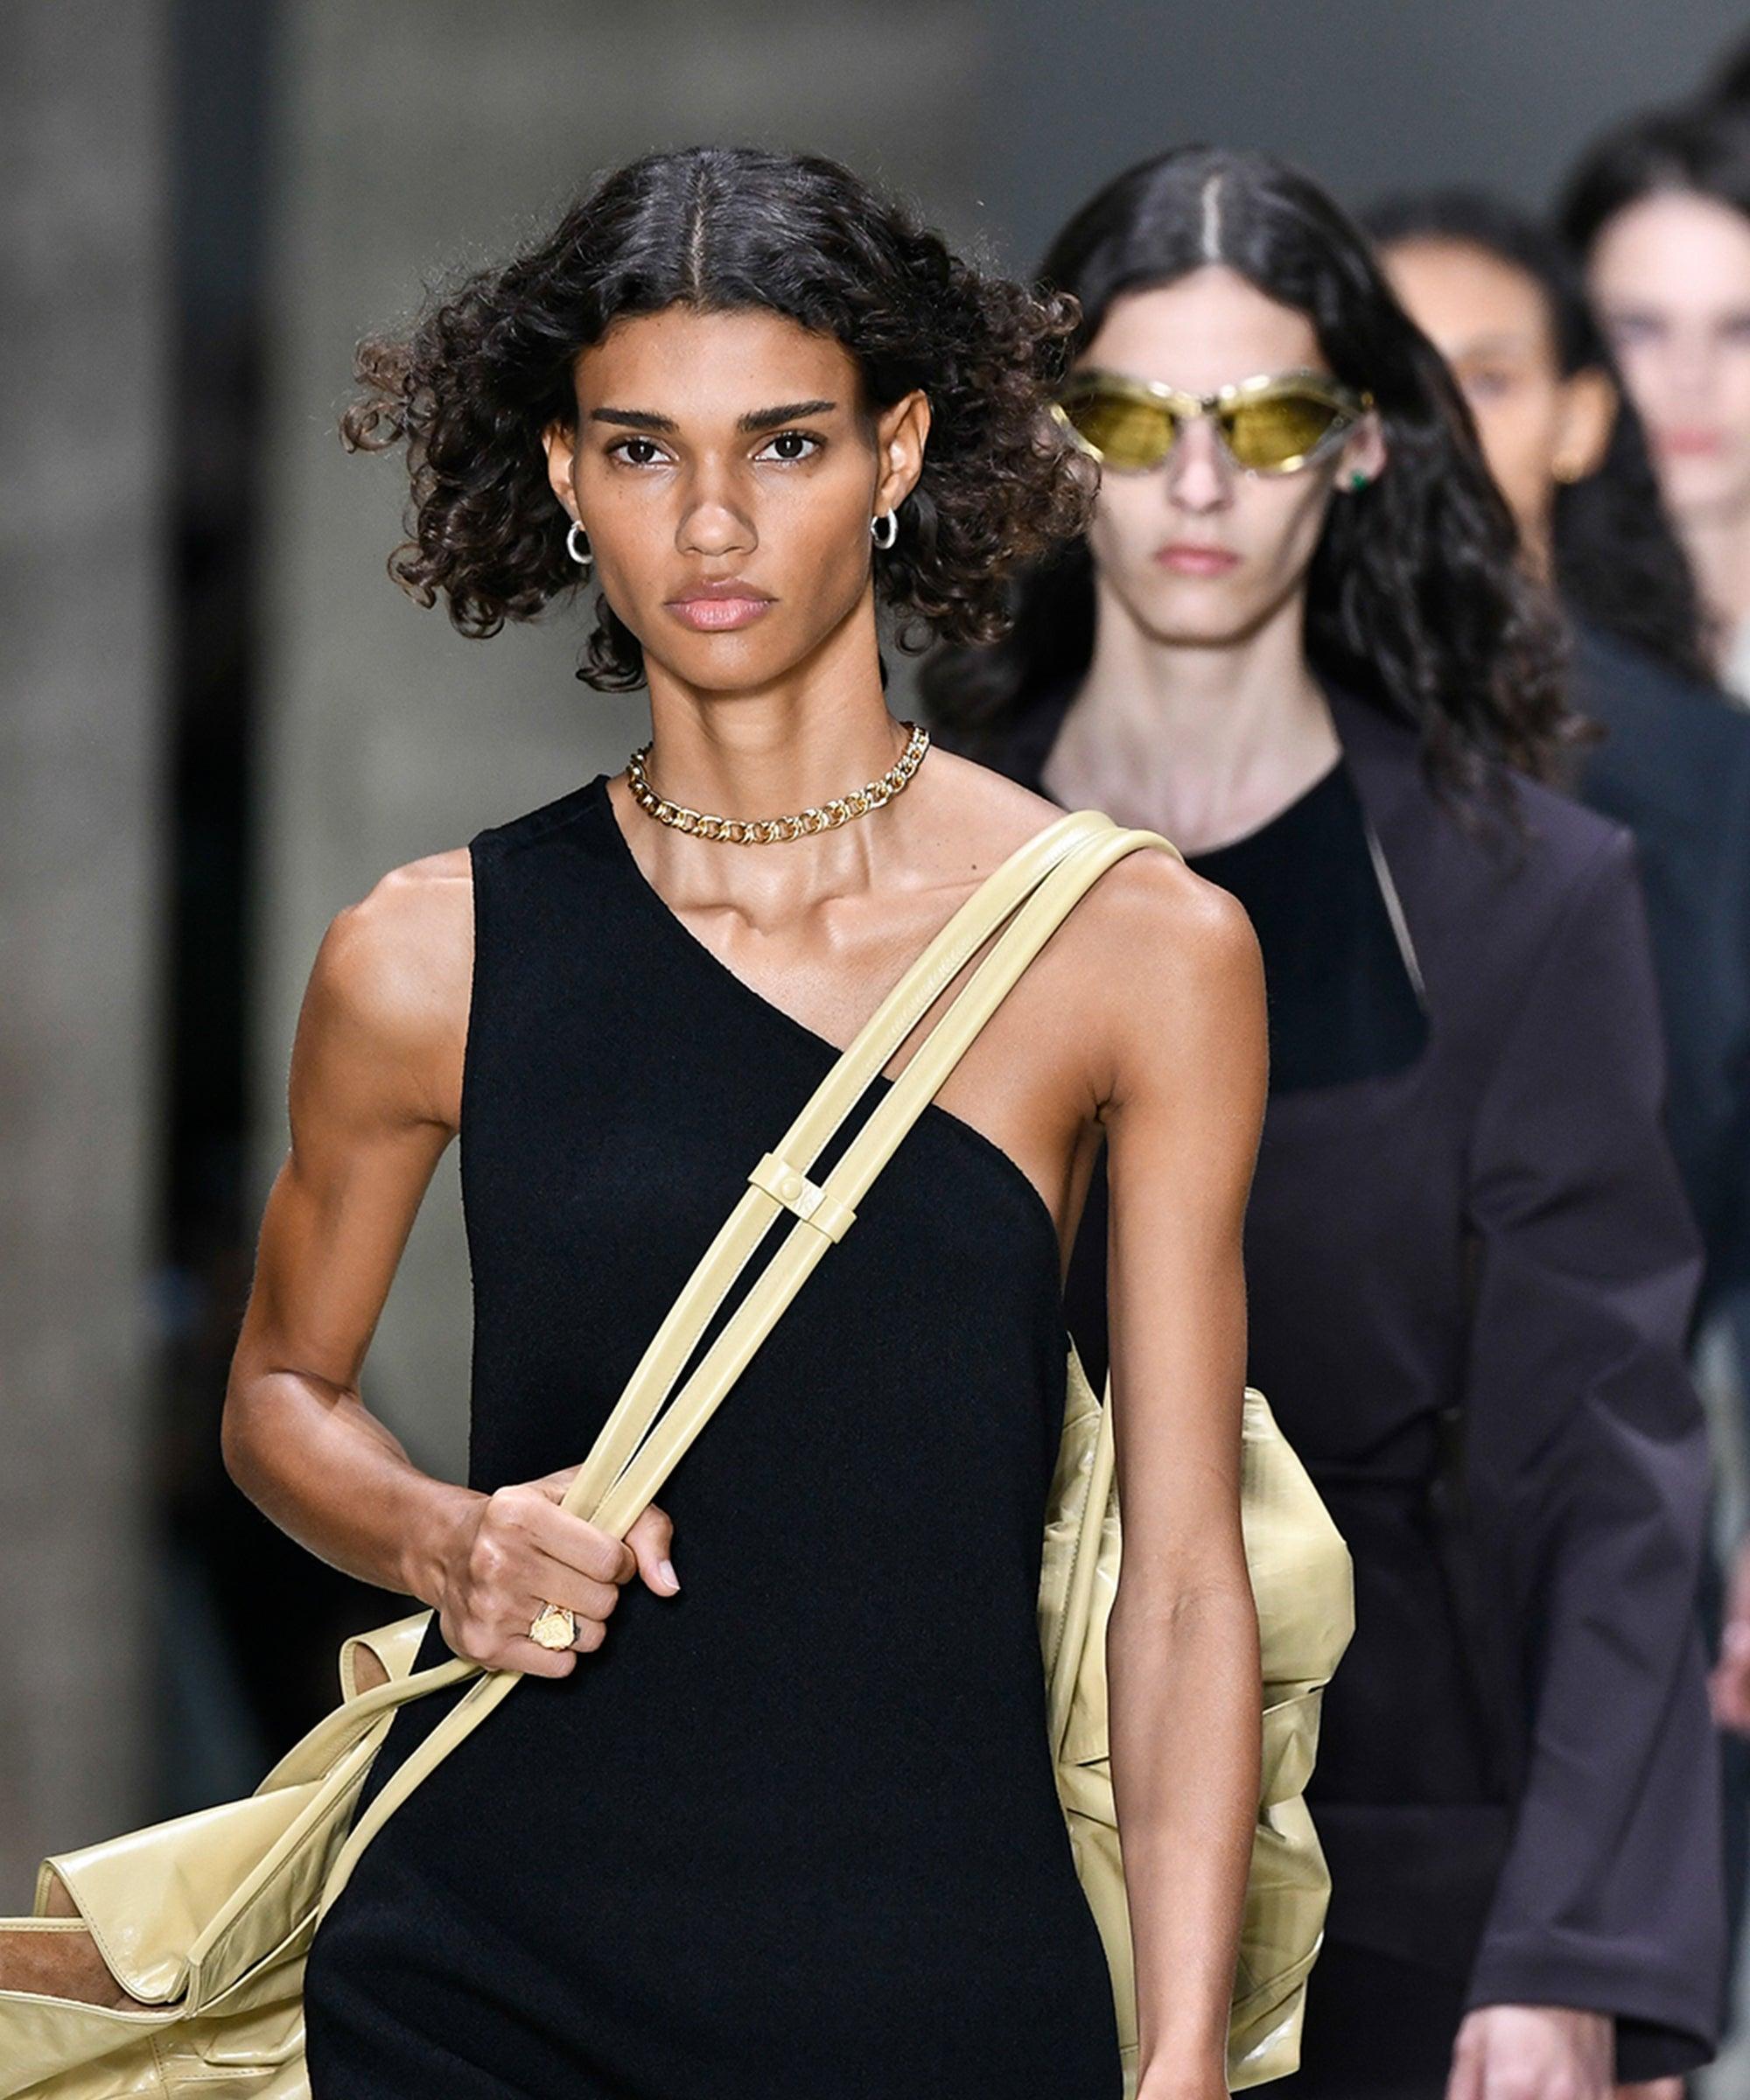 Bottega Veneta Actually Might Be The New Celine